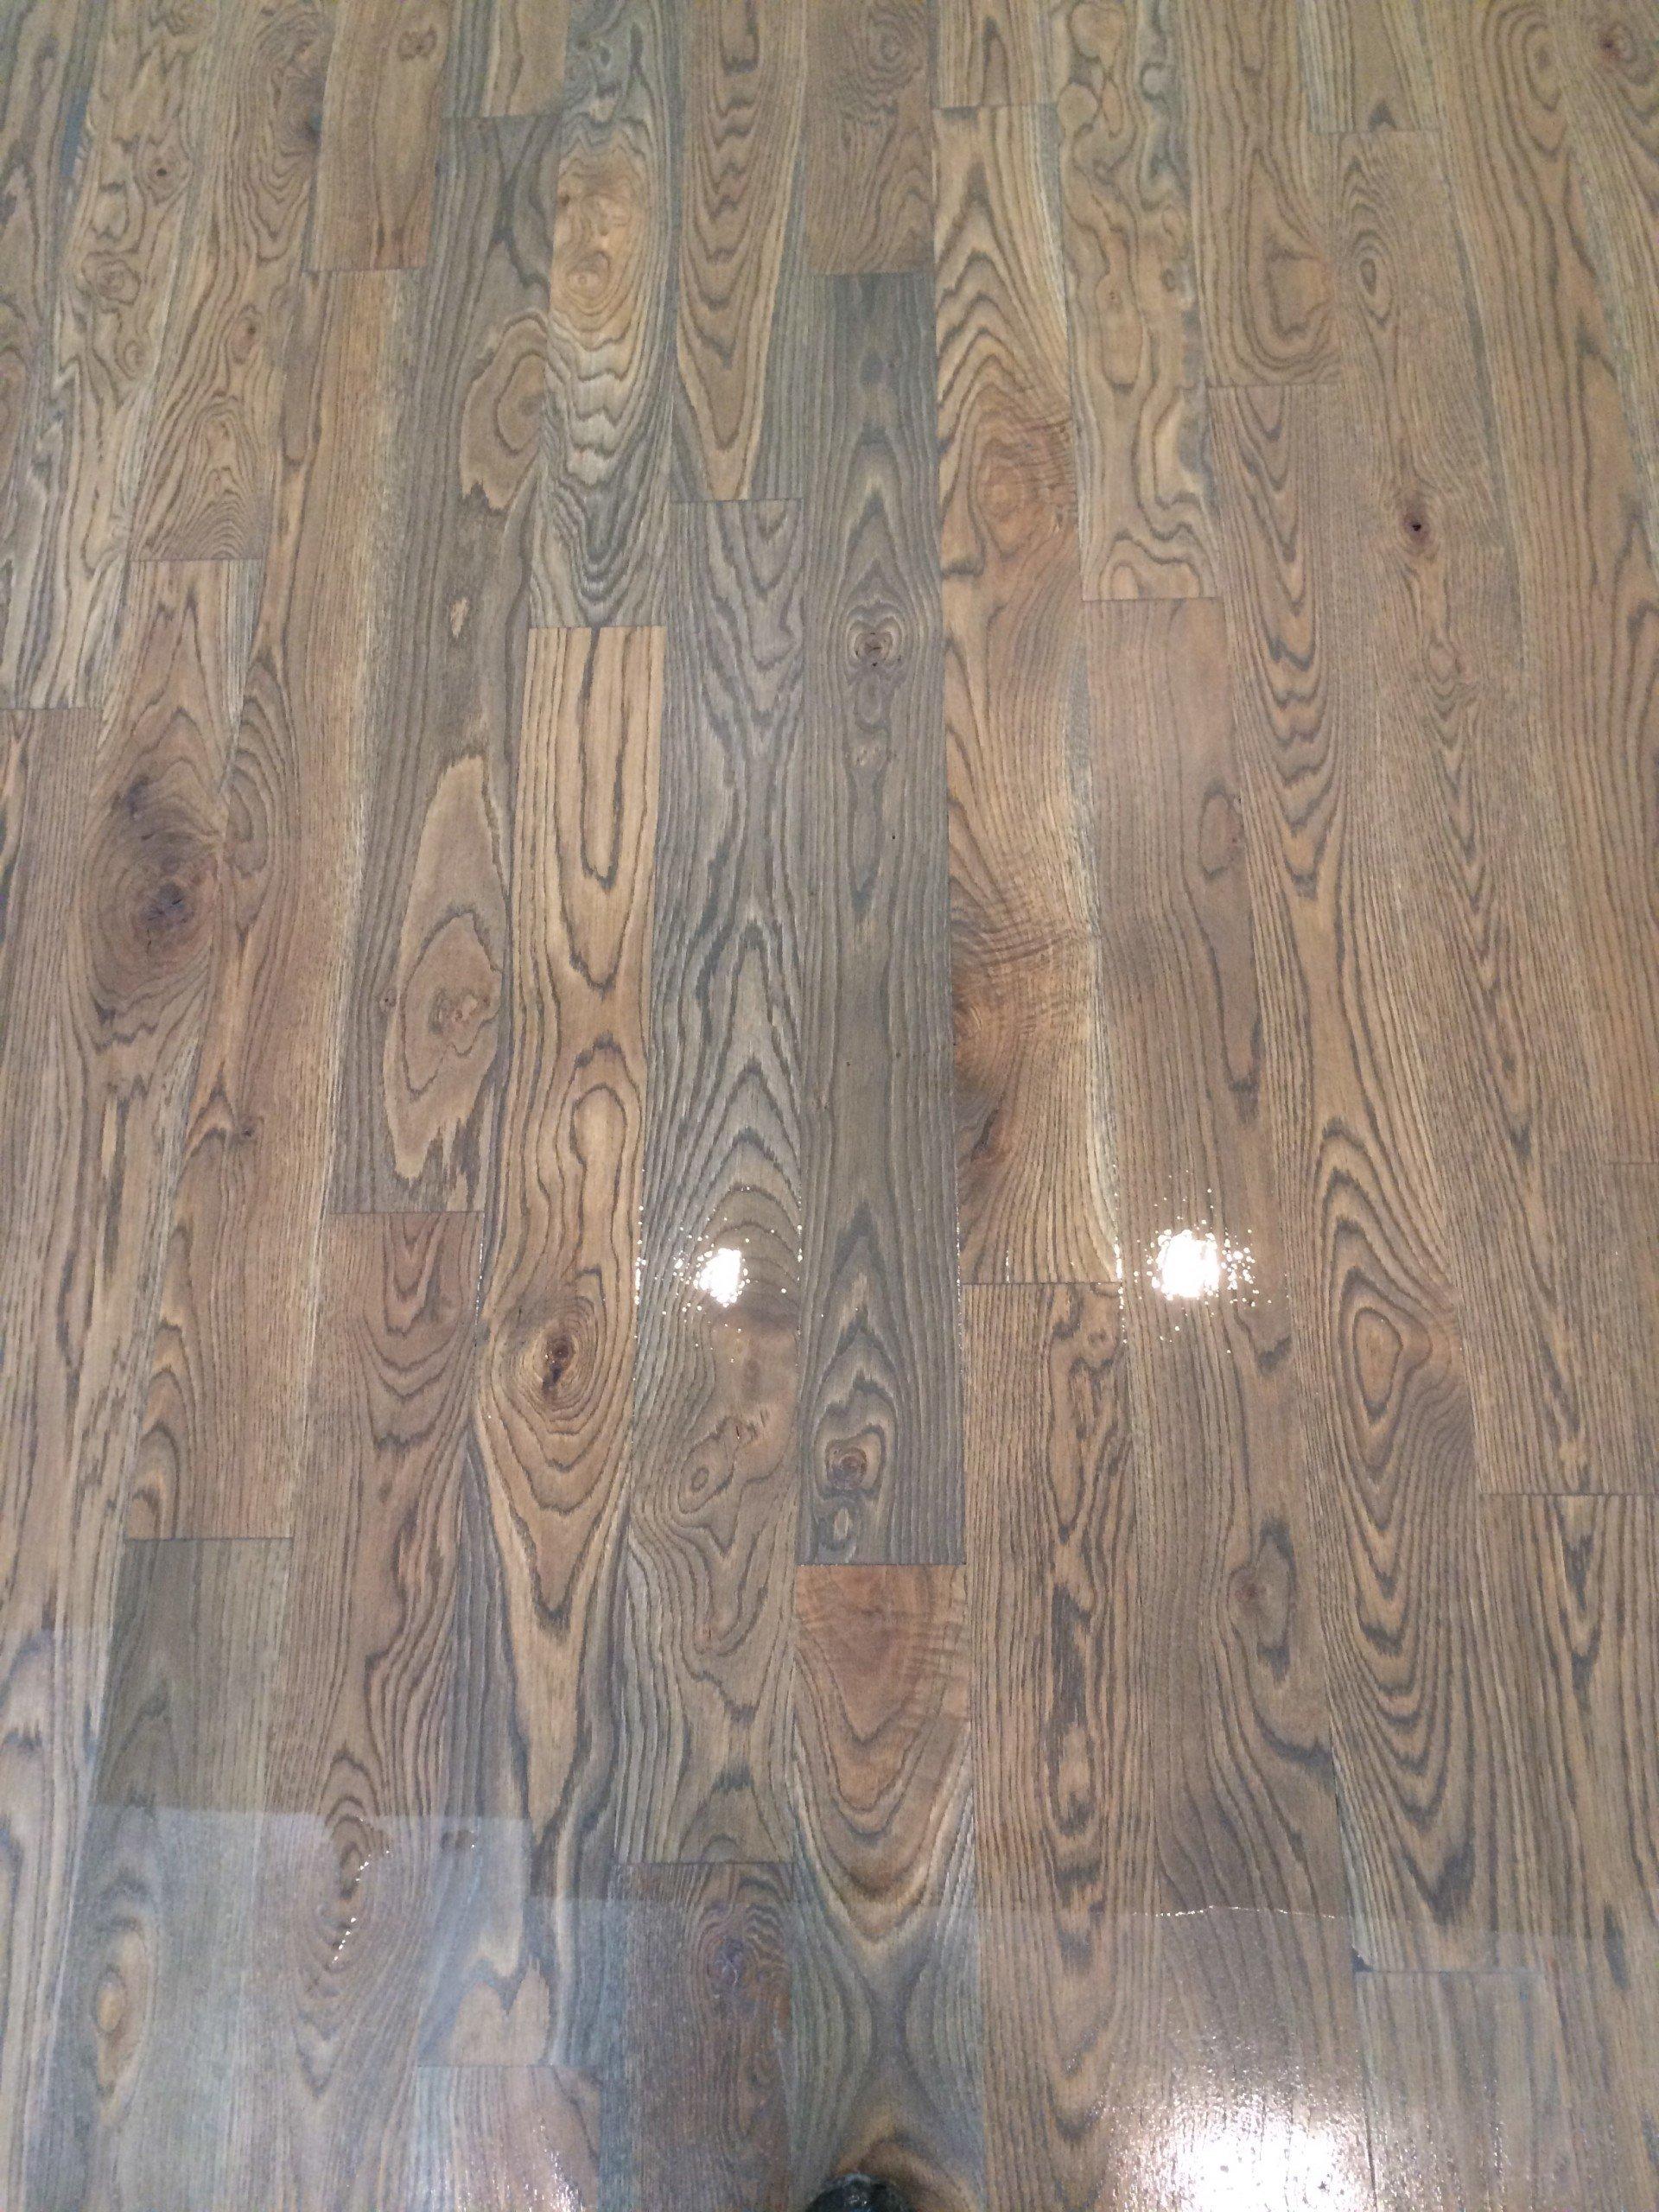 Davis Hardwood Flooring image 1